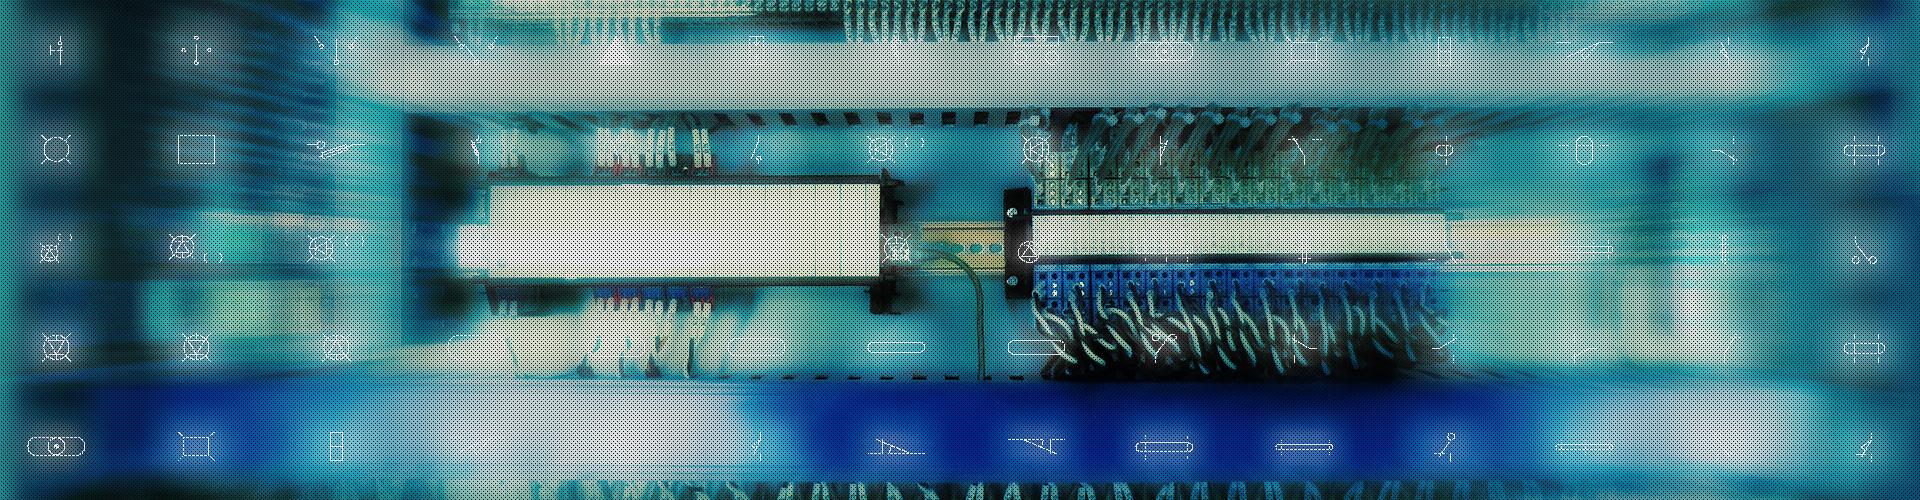 PLC、タッチパネル制御盤・計装盤・分電盤の設計、製作